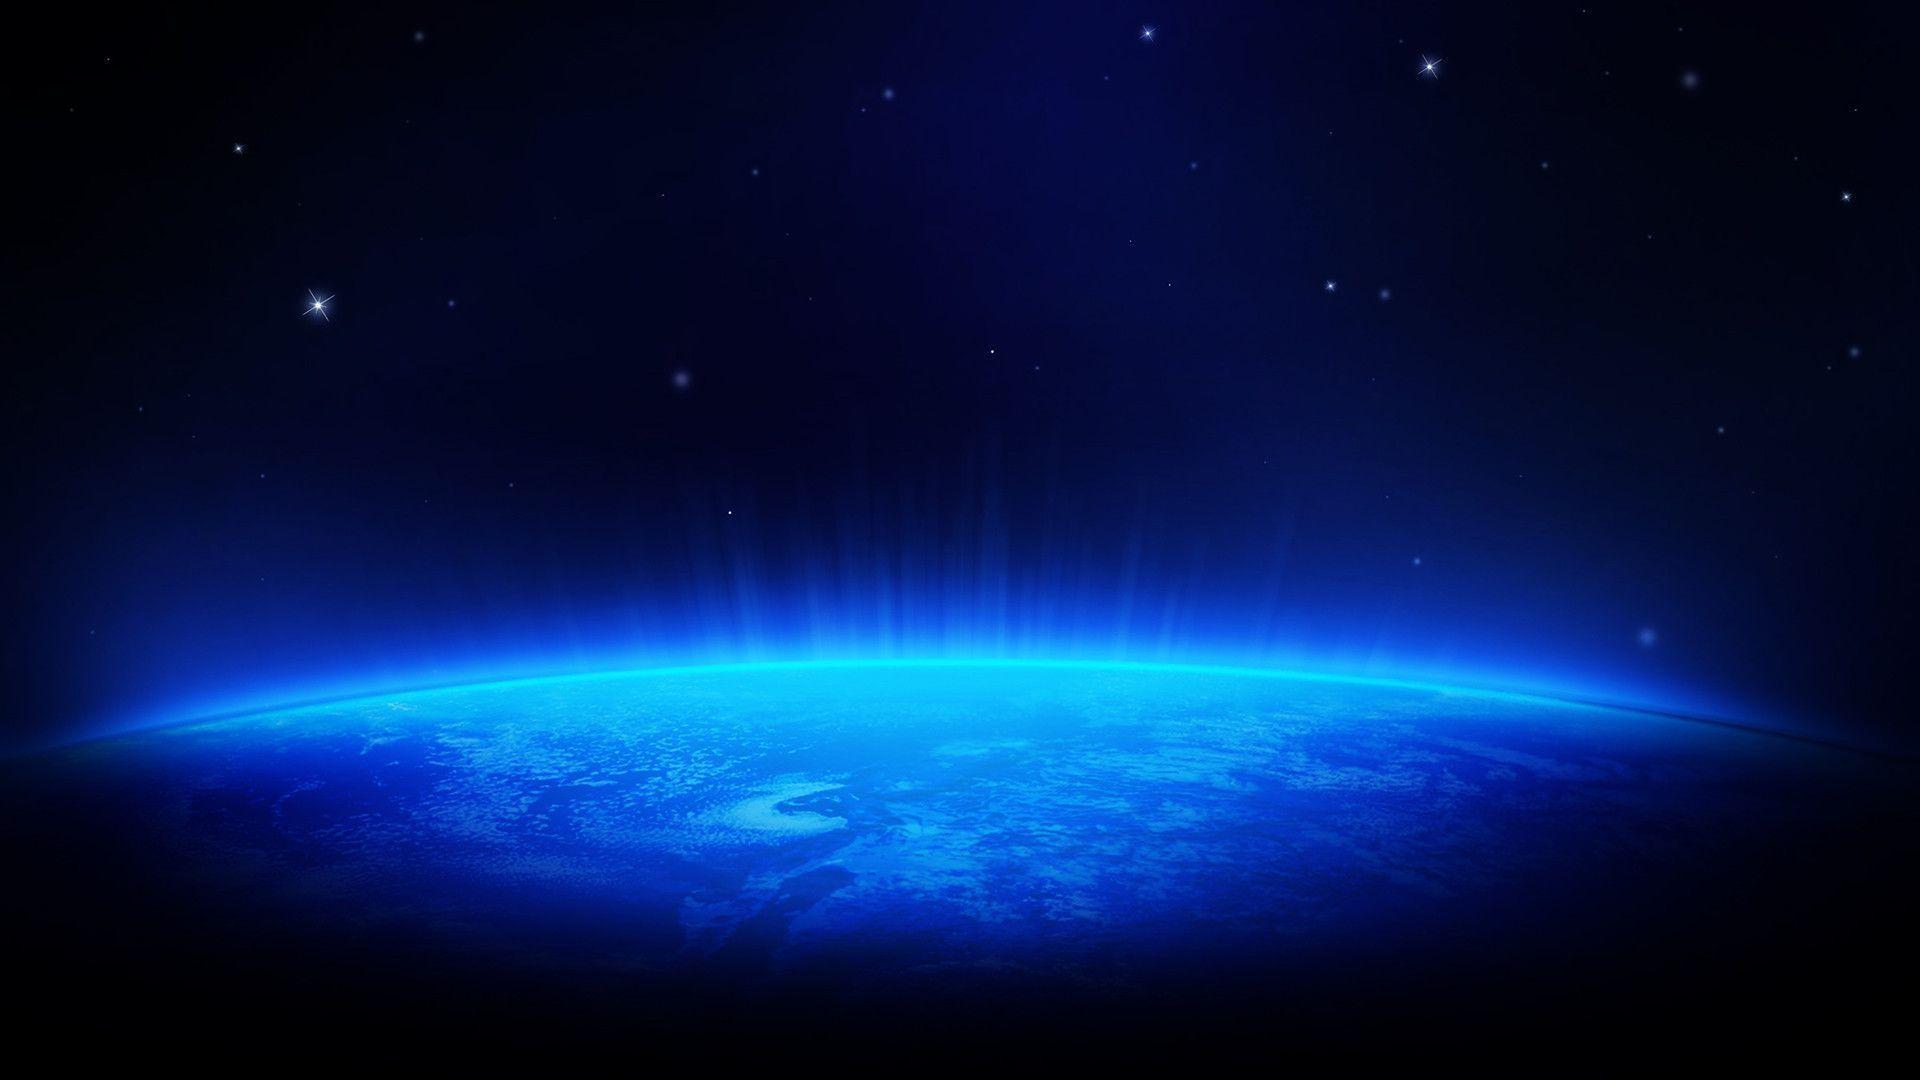 Blue Space HD Wallpaper @ 1080p HD Wallpapers